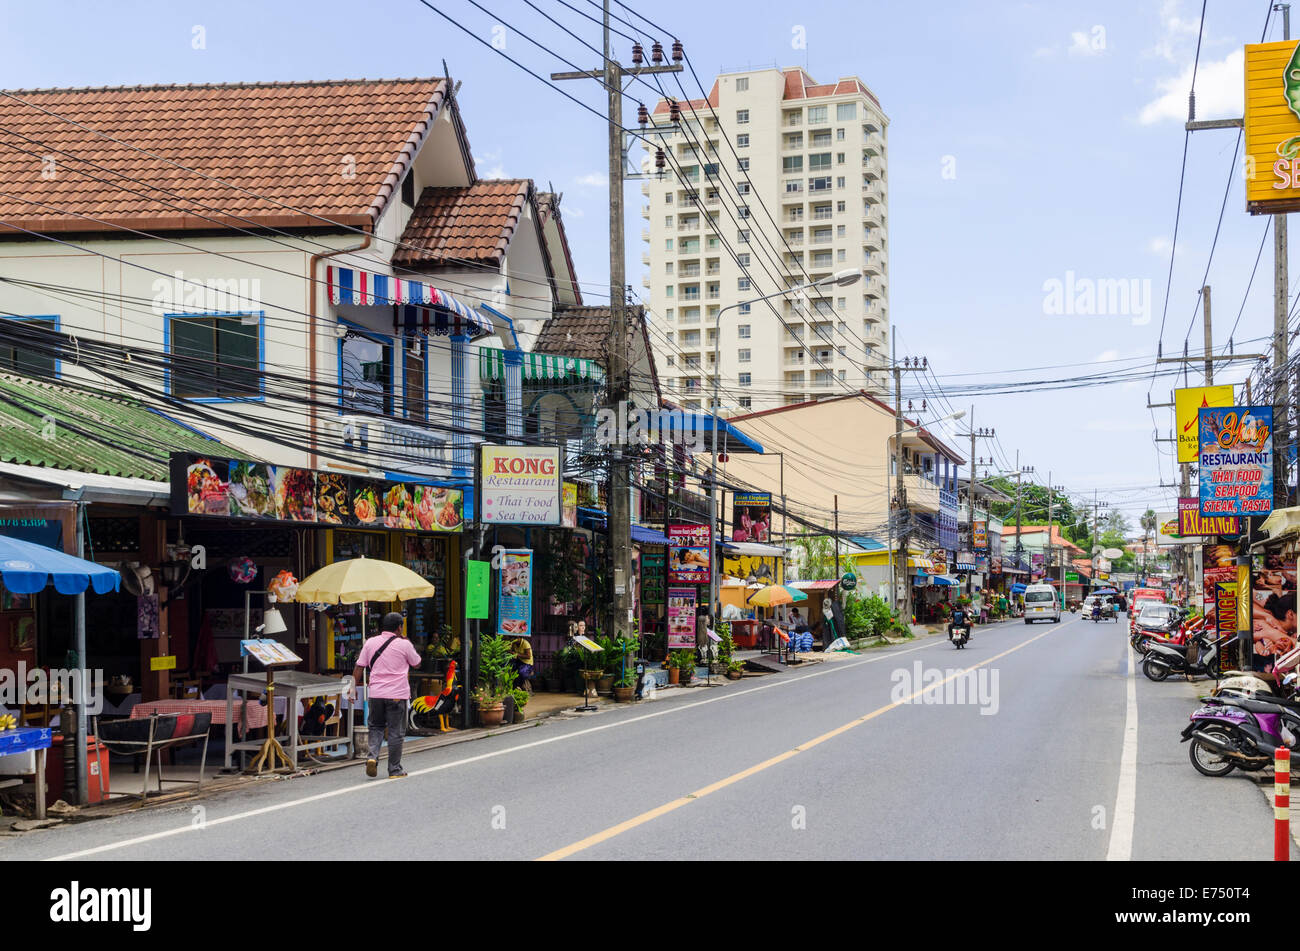 Restaurant lined Patak Rd in Karon Beach, Phuket Island, Thailand - Stock Image